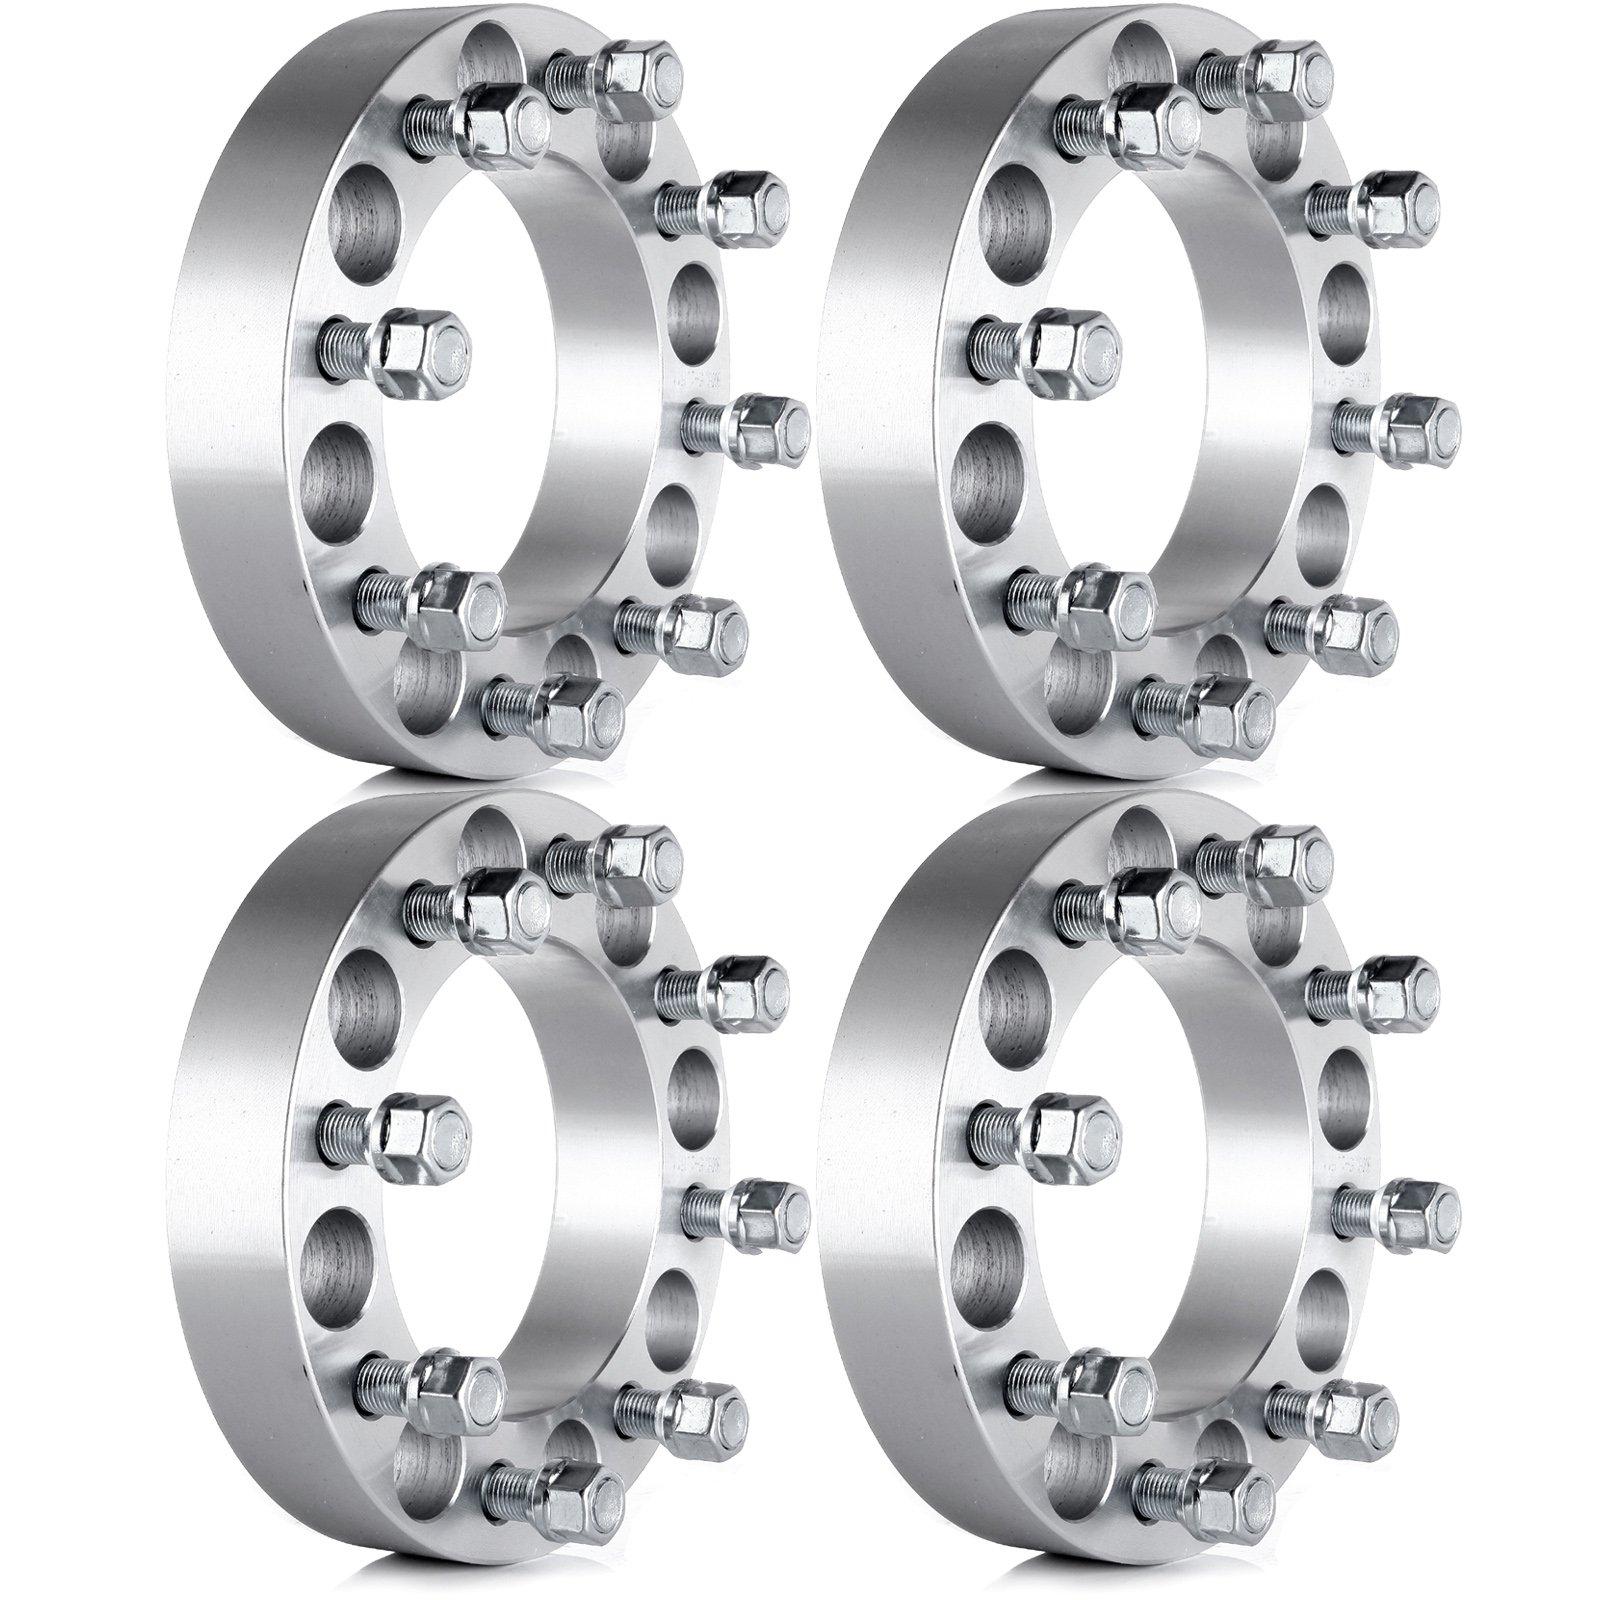 ECCPP Wheel Spacers, Wheel Spacer Adapters 4X 1.5 8x6.5 to 8x6.5(8x165.1 mm) for 99-10 Chevy Silverado GMC Sierra 1500HD 2500HD 3500HD Thread Size 14x1.5(126.15 mm) (4PC 1.5''|8x6.5)